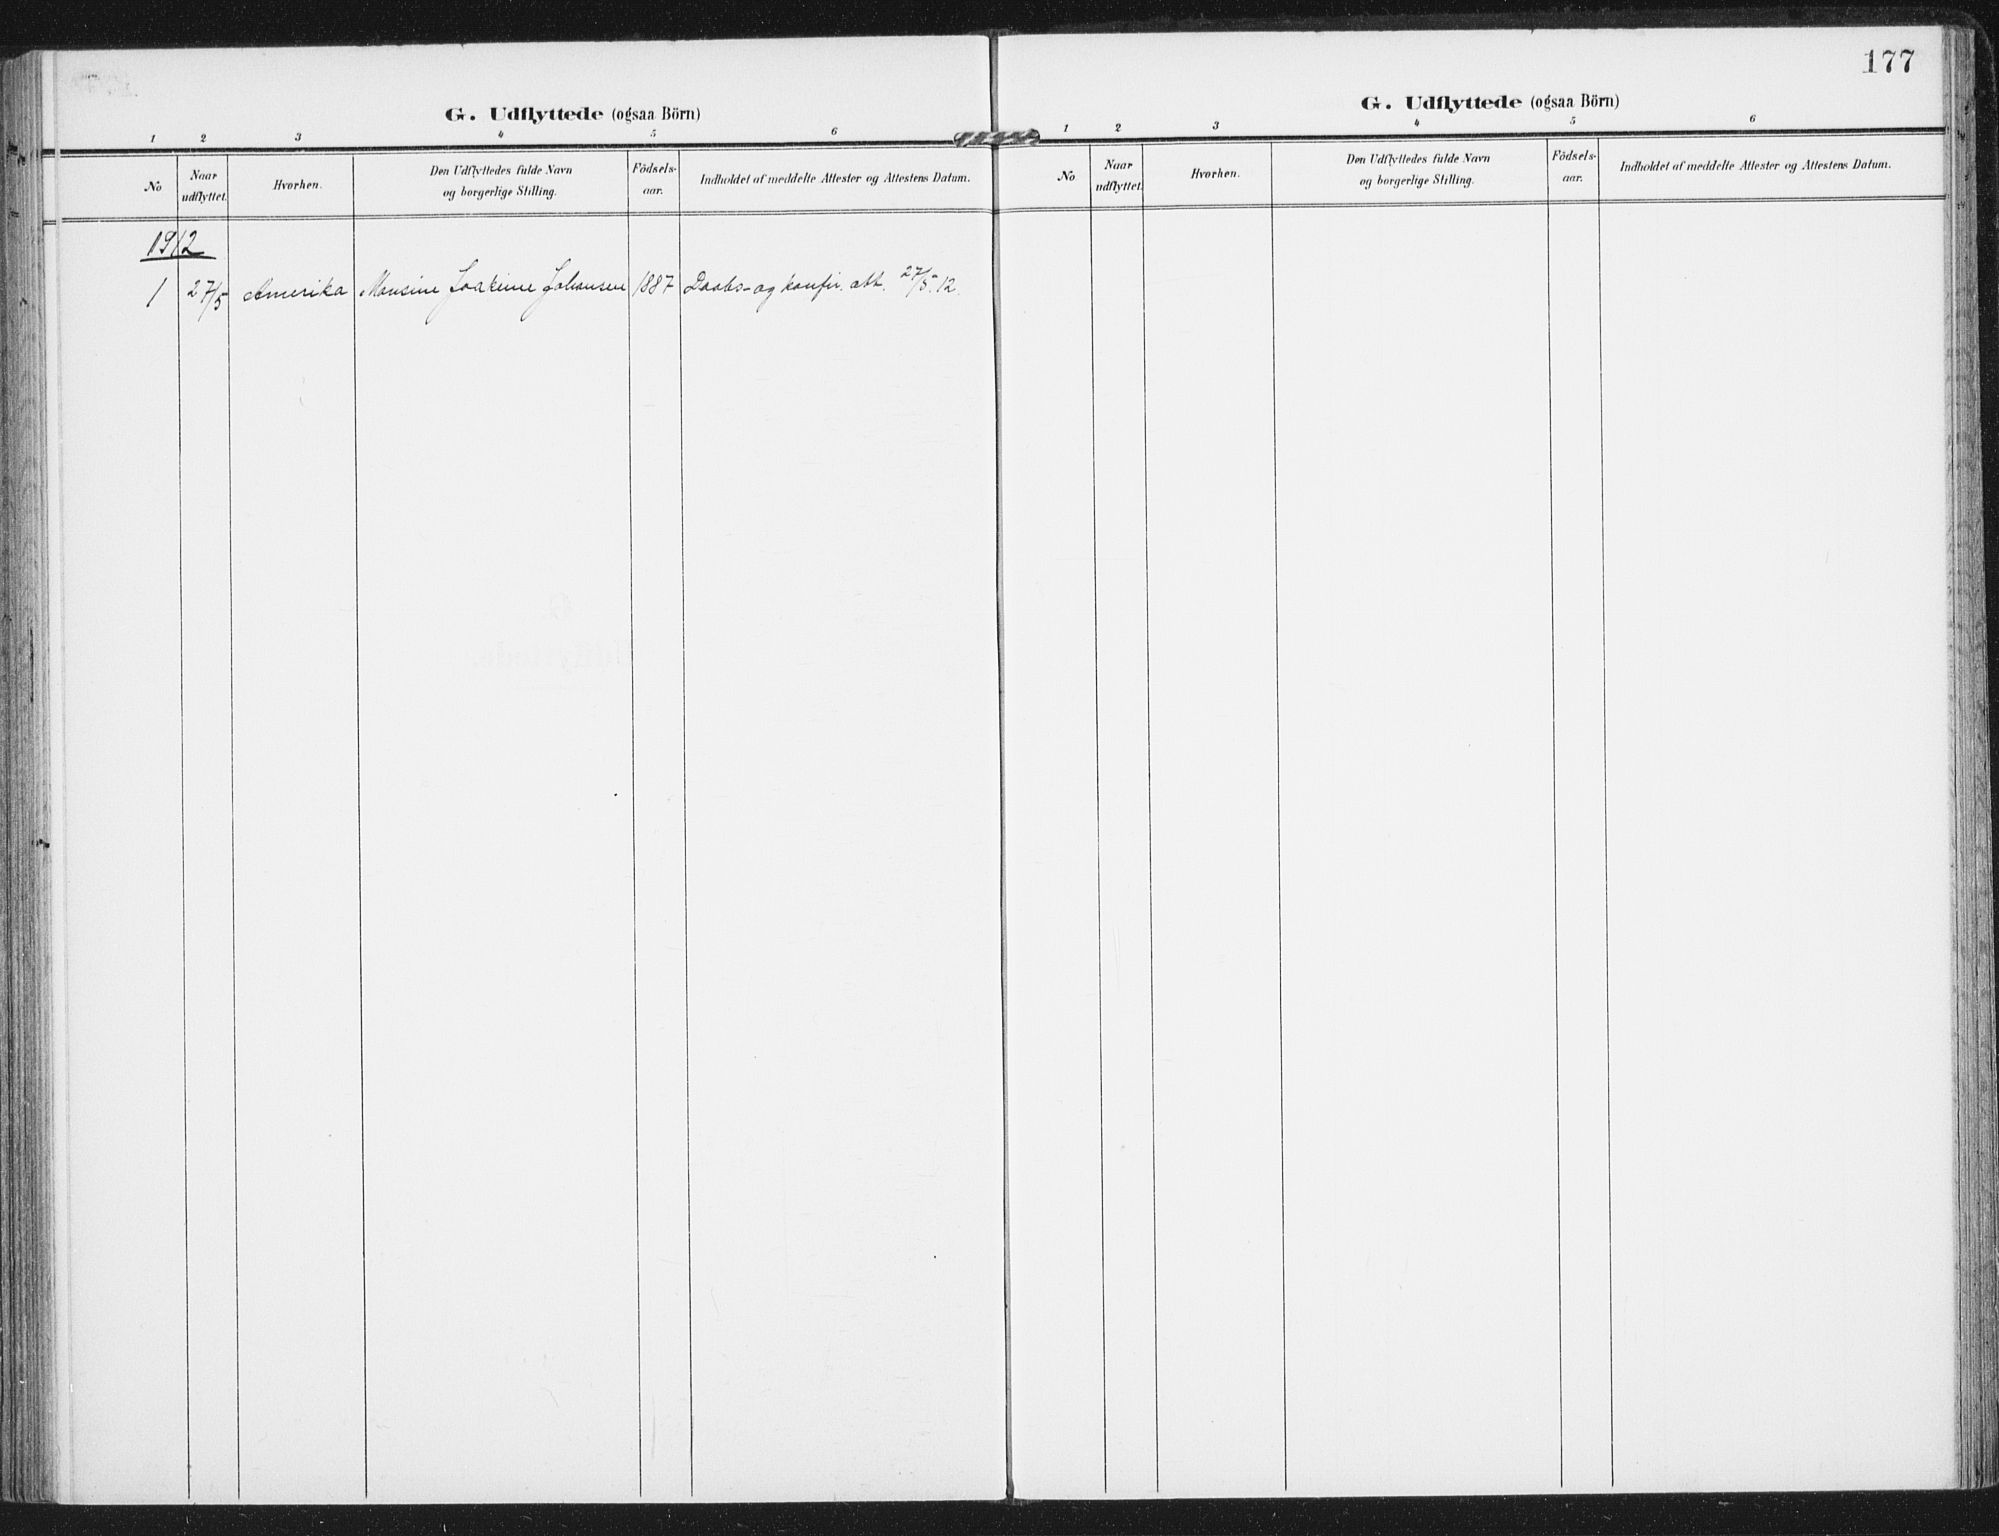 SAT, Ministerialprotokoller, klokkerbøker og fødselsregistre - Nordland, 885/L1206: Ministerialbok nr. 885A07, 1905-1915, s. 177